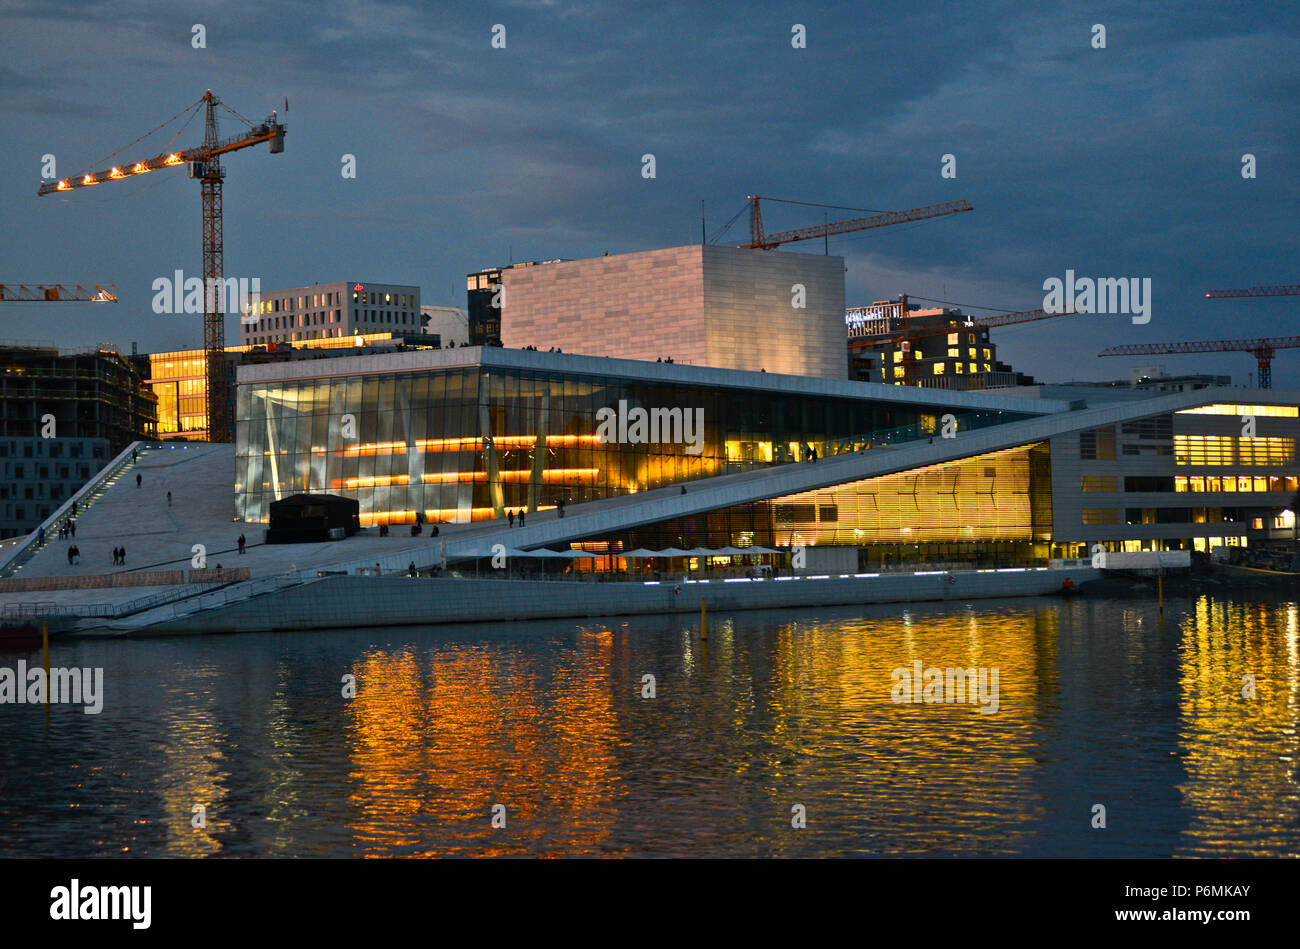 Oslo Opera House, Norway - Stock Image